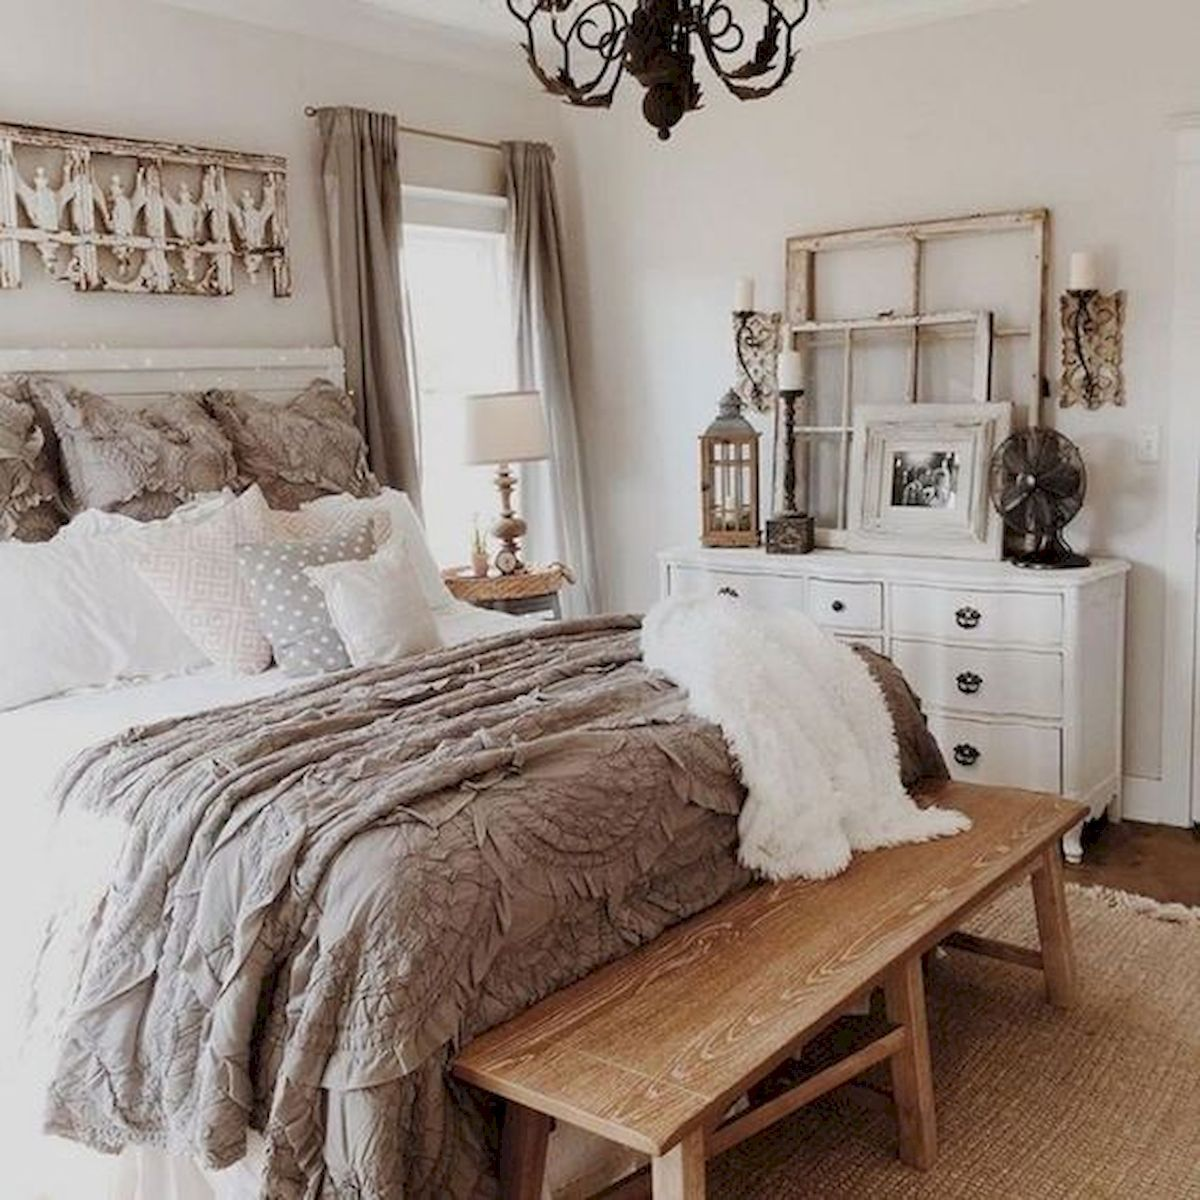 50 Awesome Farmhouse Bedroom Decor Ideas And Remodel 13 Farmhouse Style Master Bedroom Home Decor Bedroom Master Bedrooms Decor